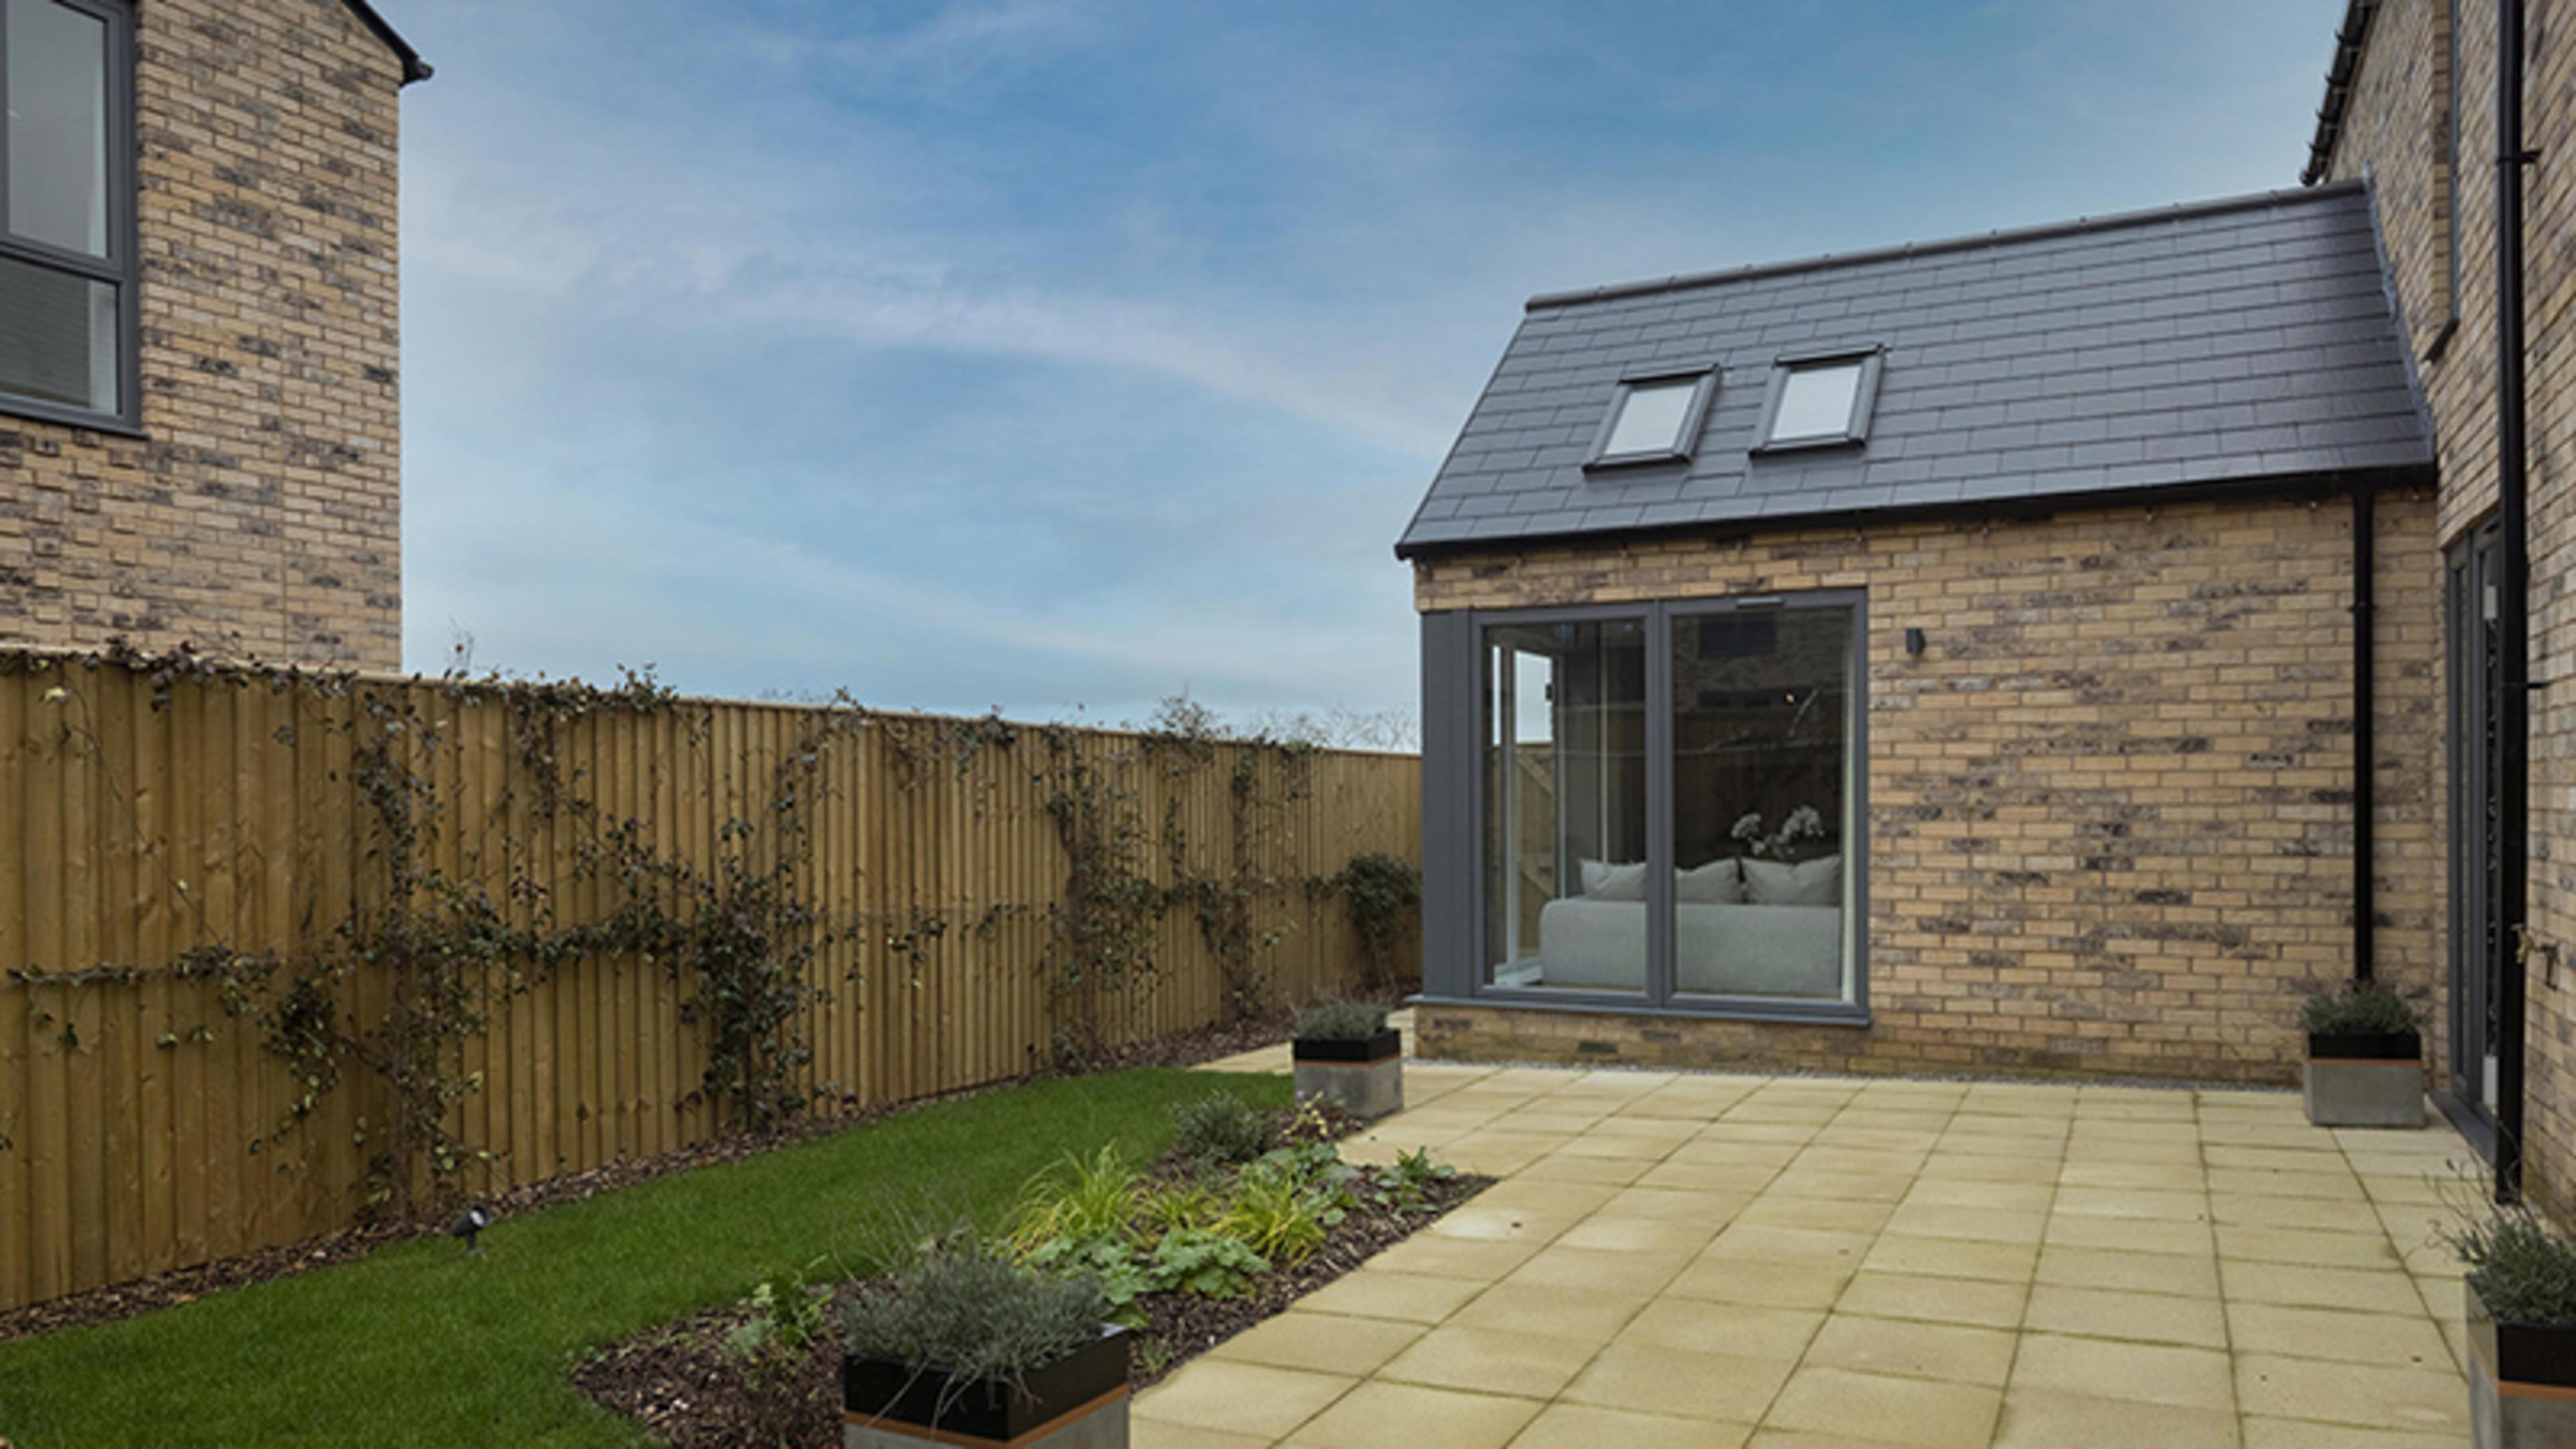 watling-grange-harrogate-merevale-4-bed-home-external-rear-garden-1